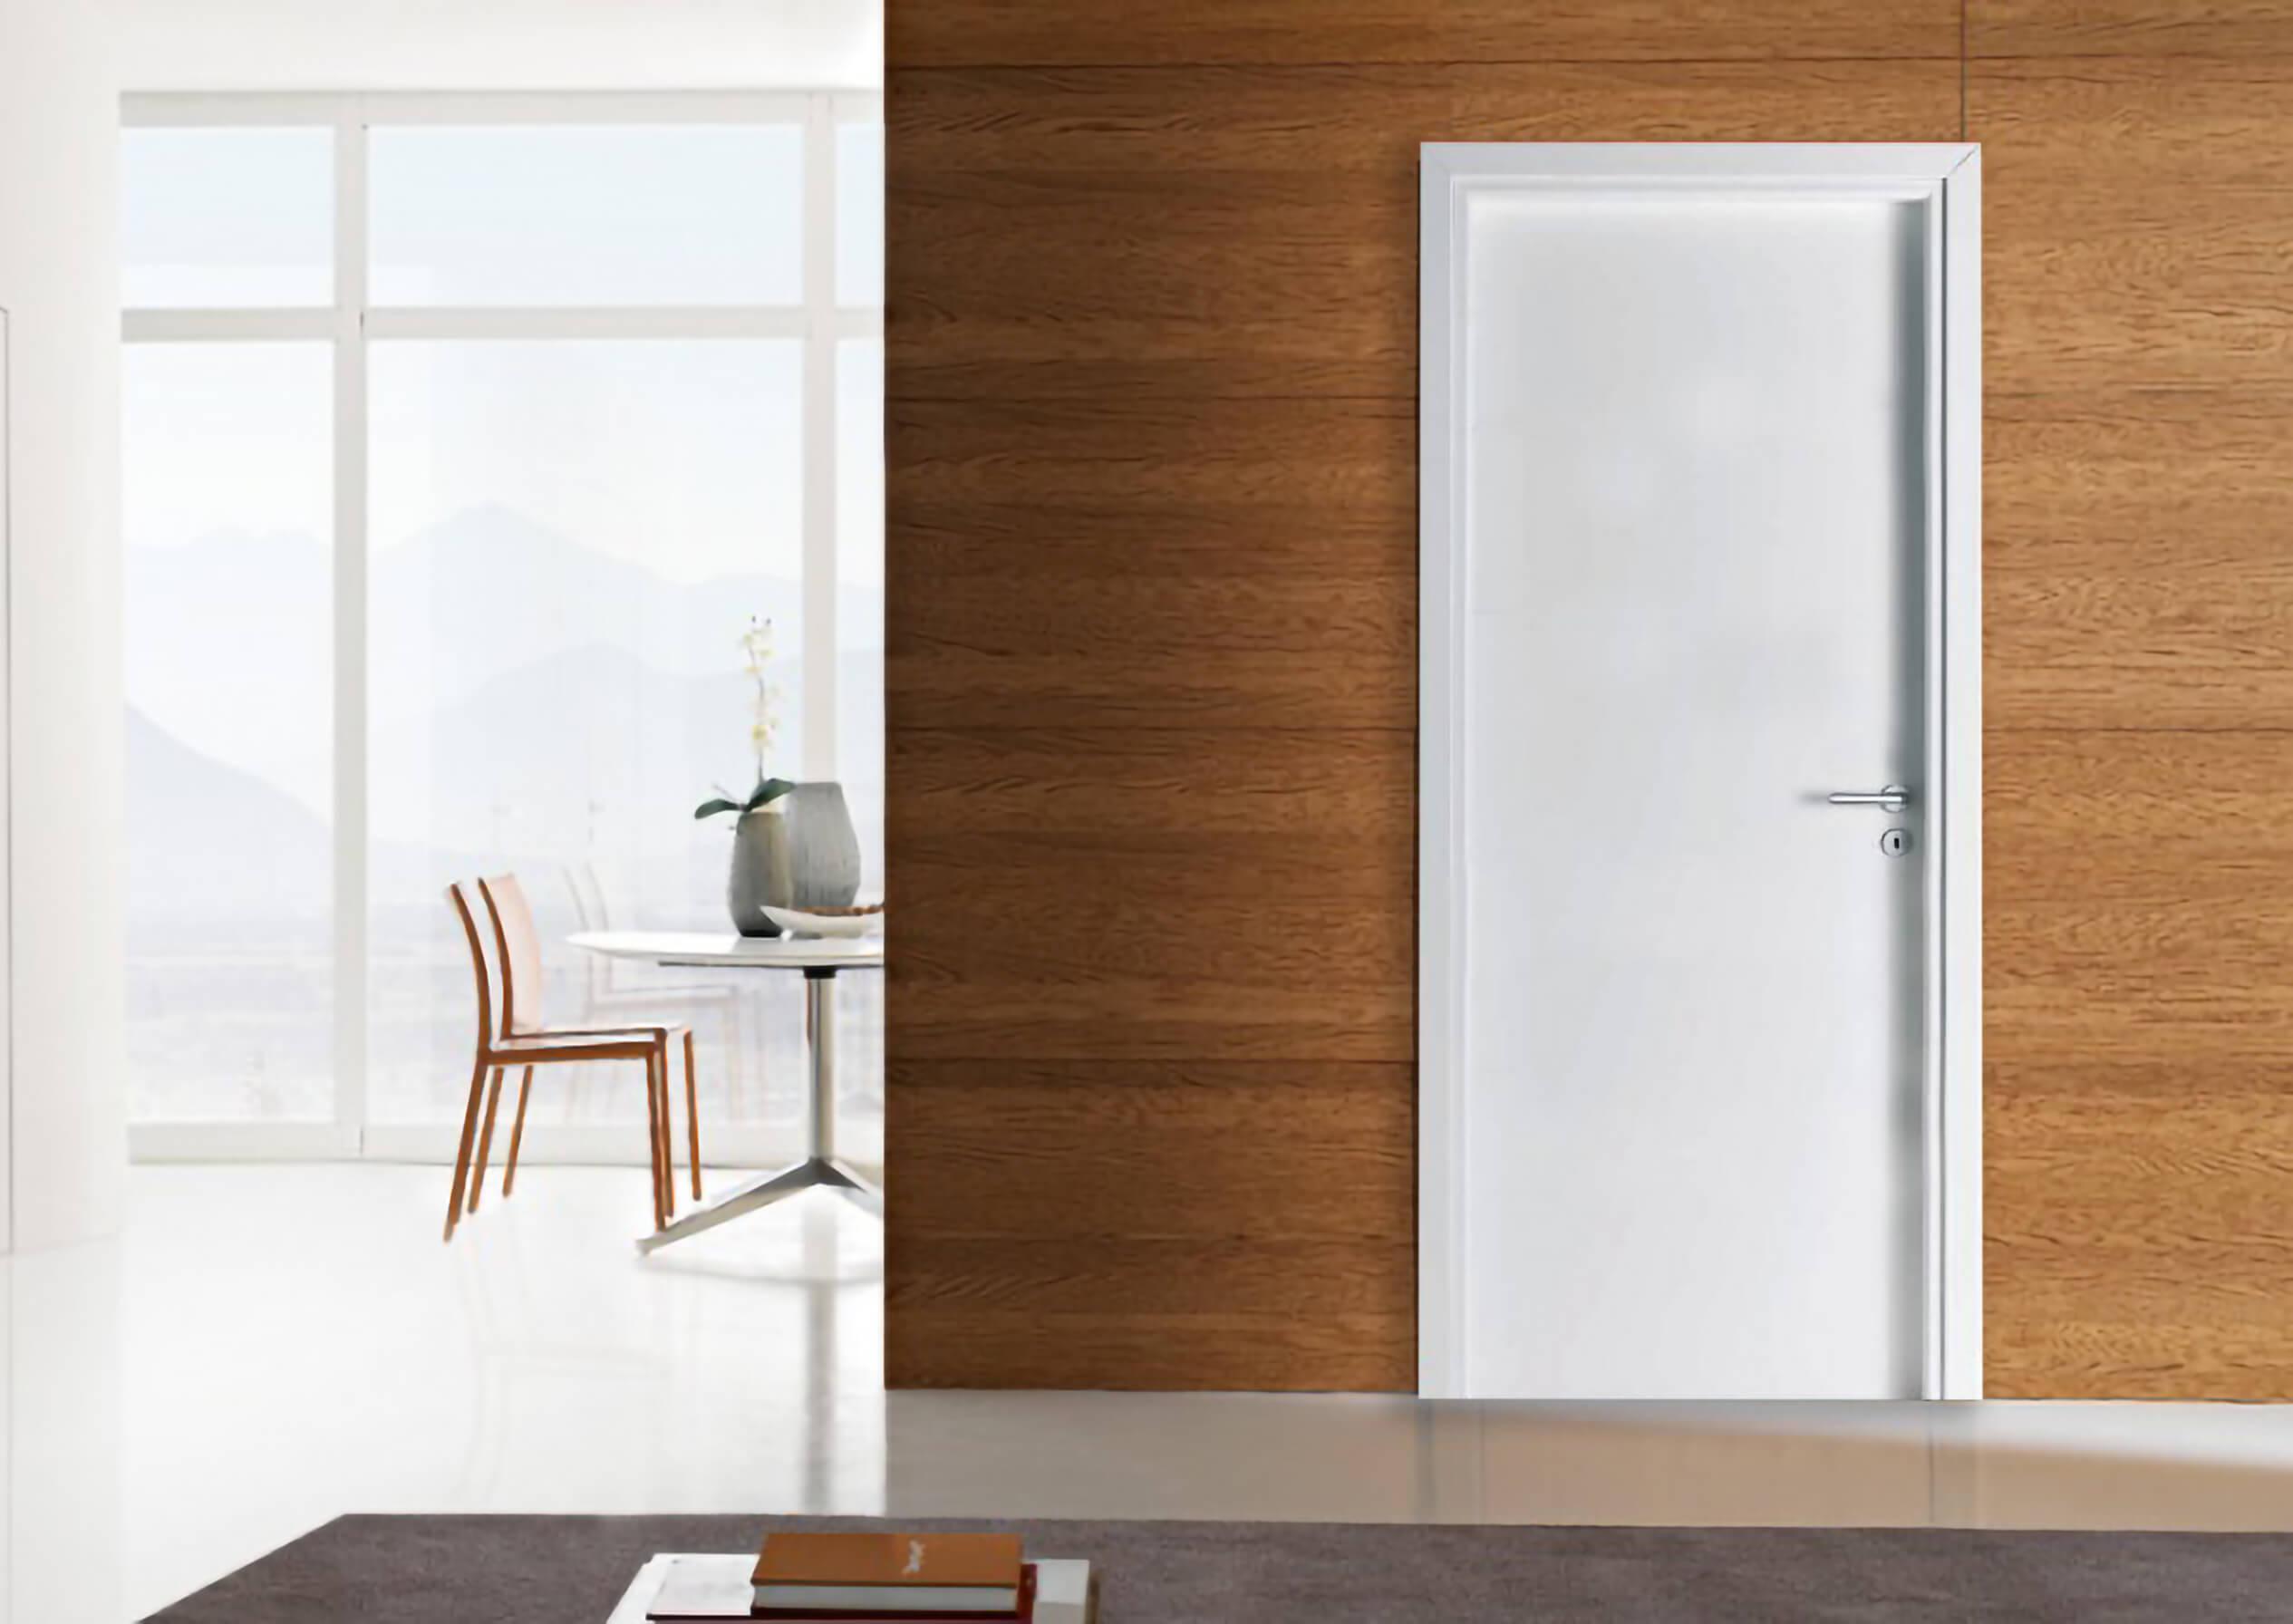 Bonus Porte Interne 2018 interior doors are indispensable elements in a home - fip